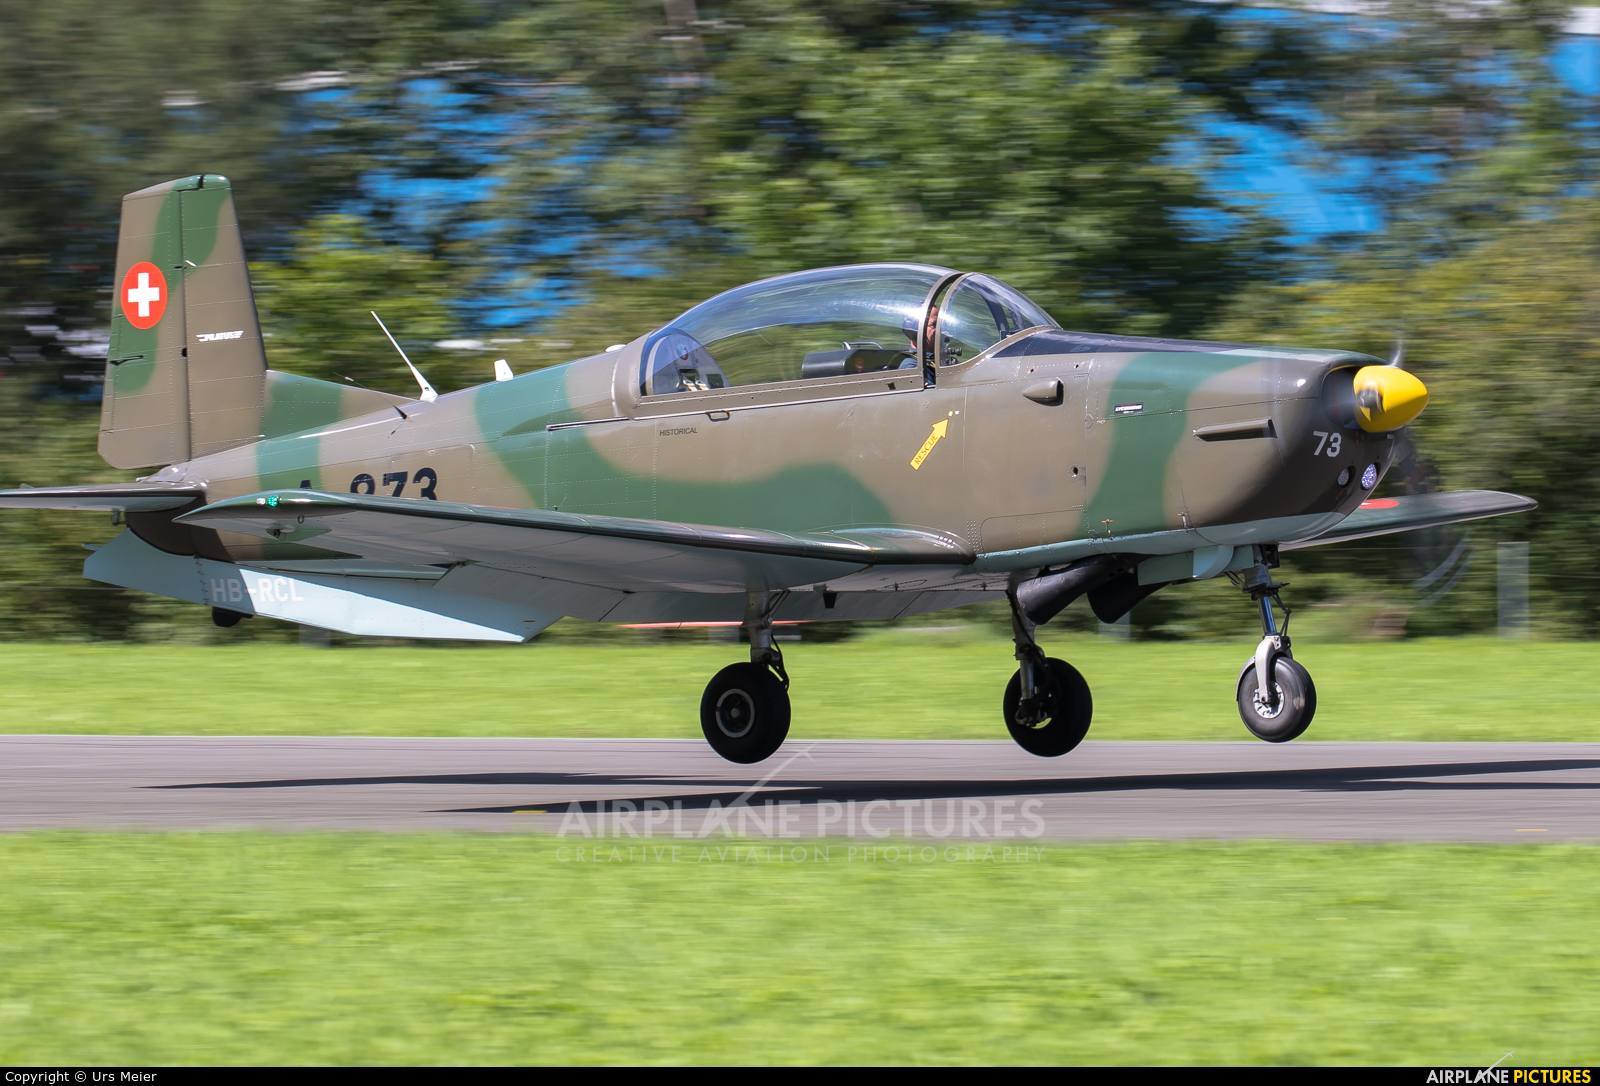 P3 Flyers Ticino HB-RCL aircraft at Mollis